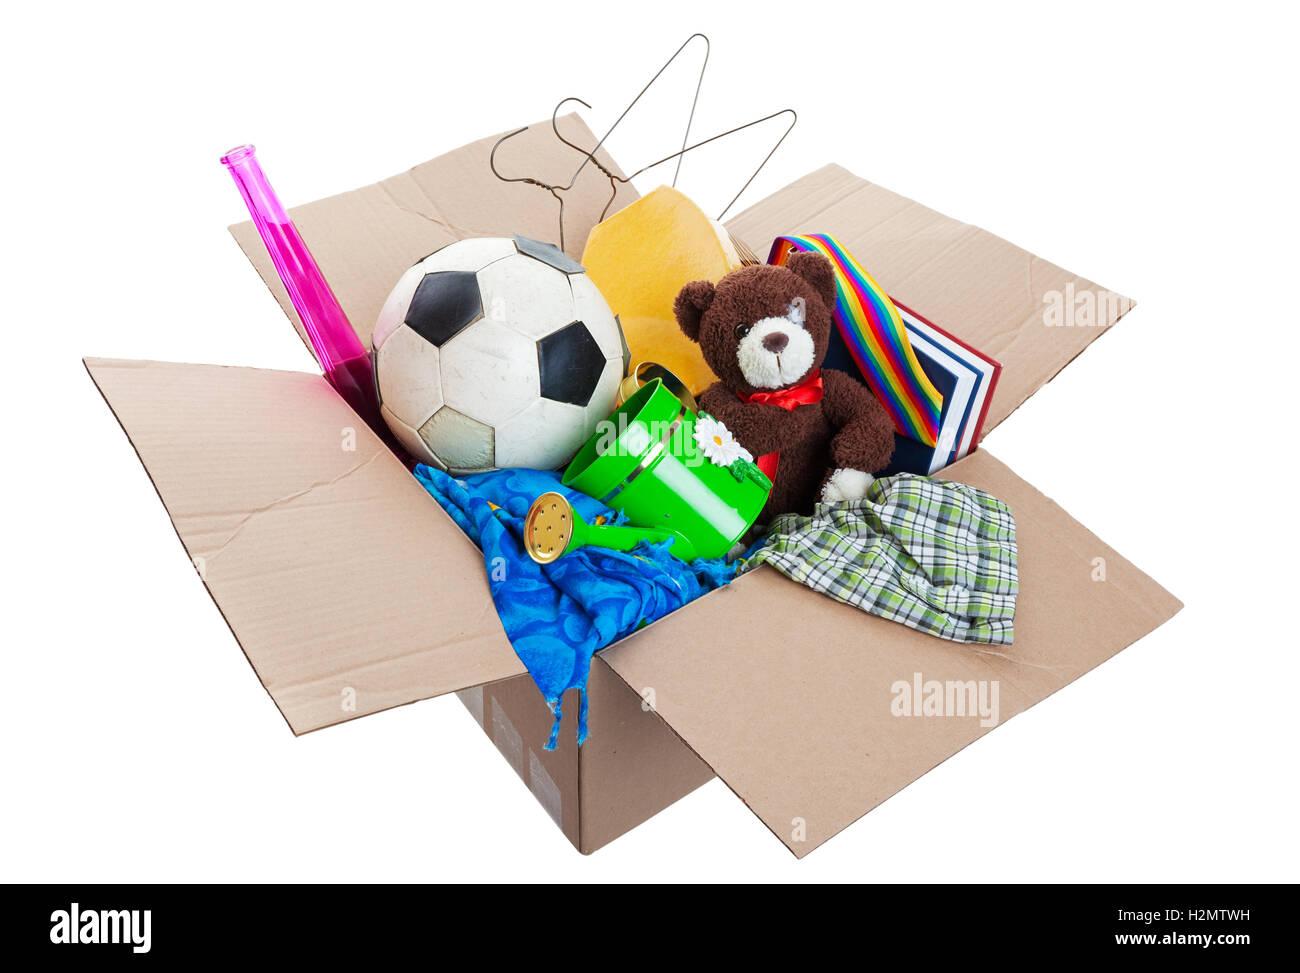 Box of Junk - Stock Image